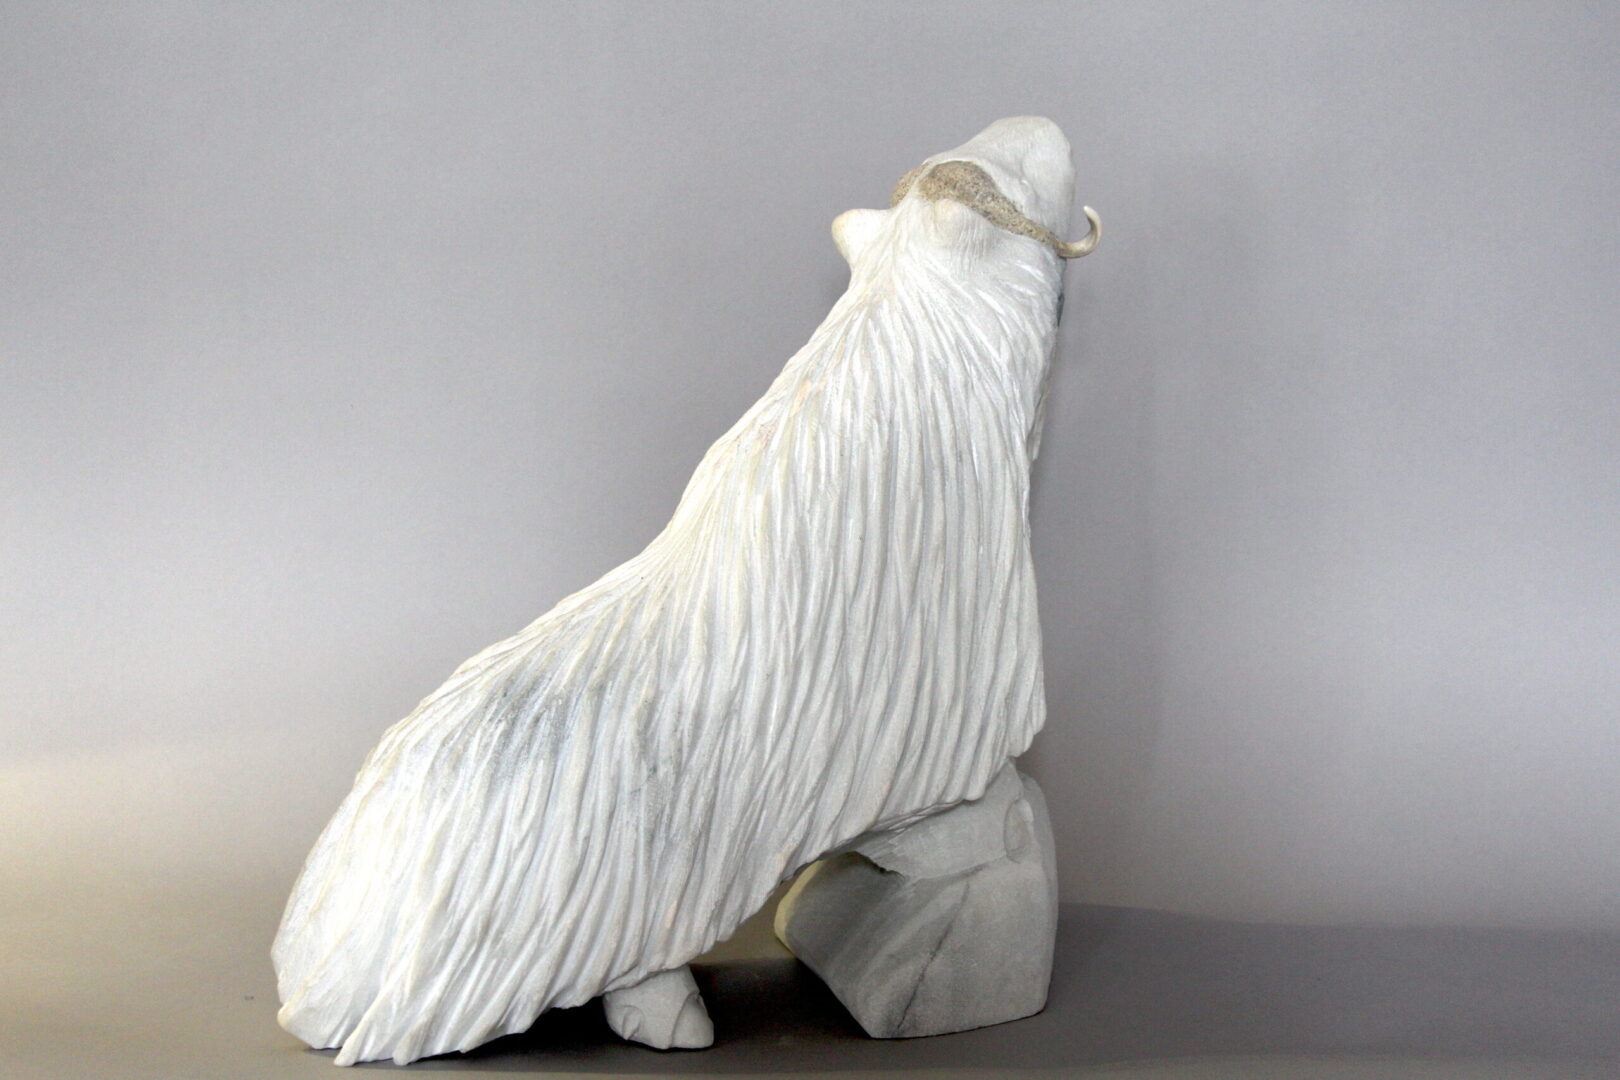 muskox Inuit Art Sculpture in marble